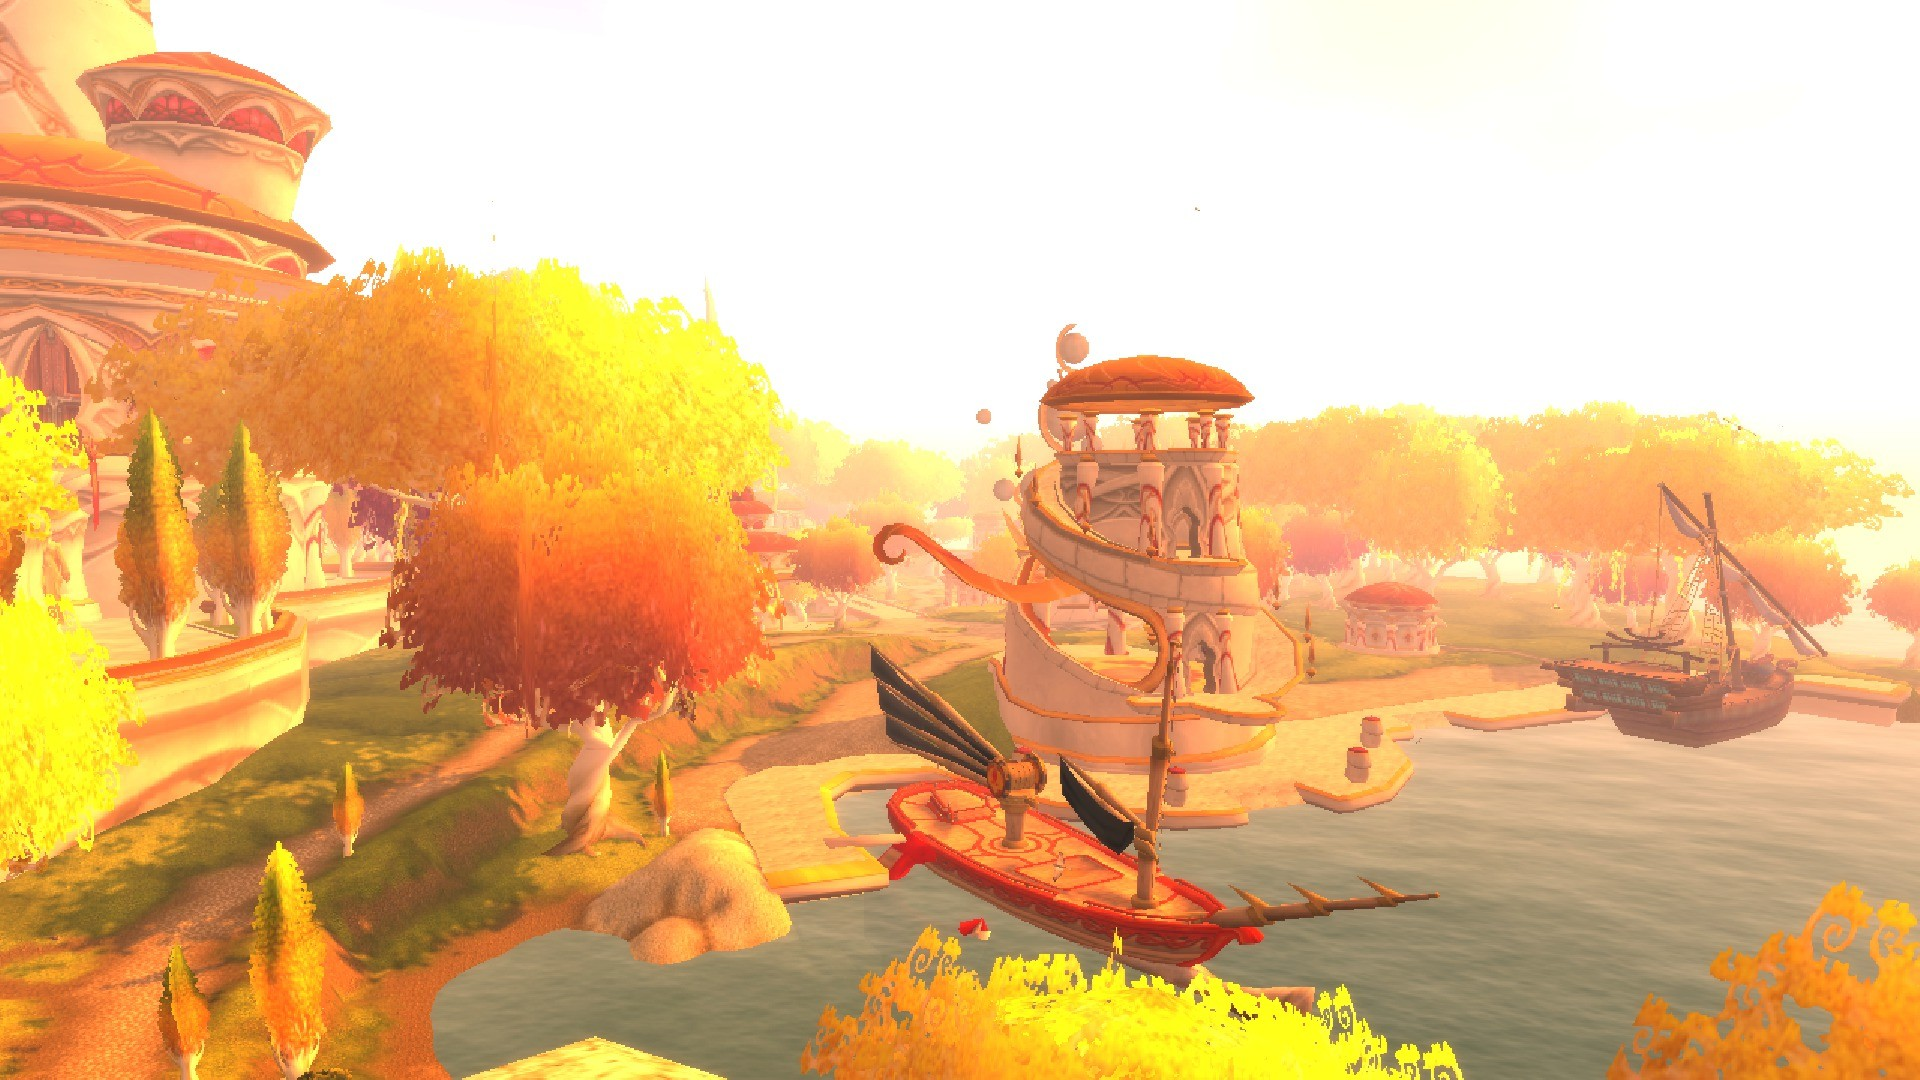 "alt=""world of warcraft story so far isle of queldanas scenery""/>"